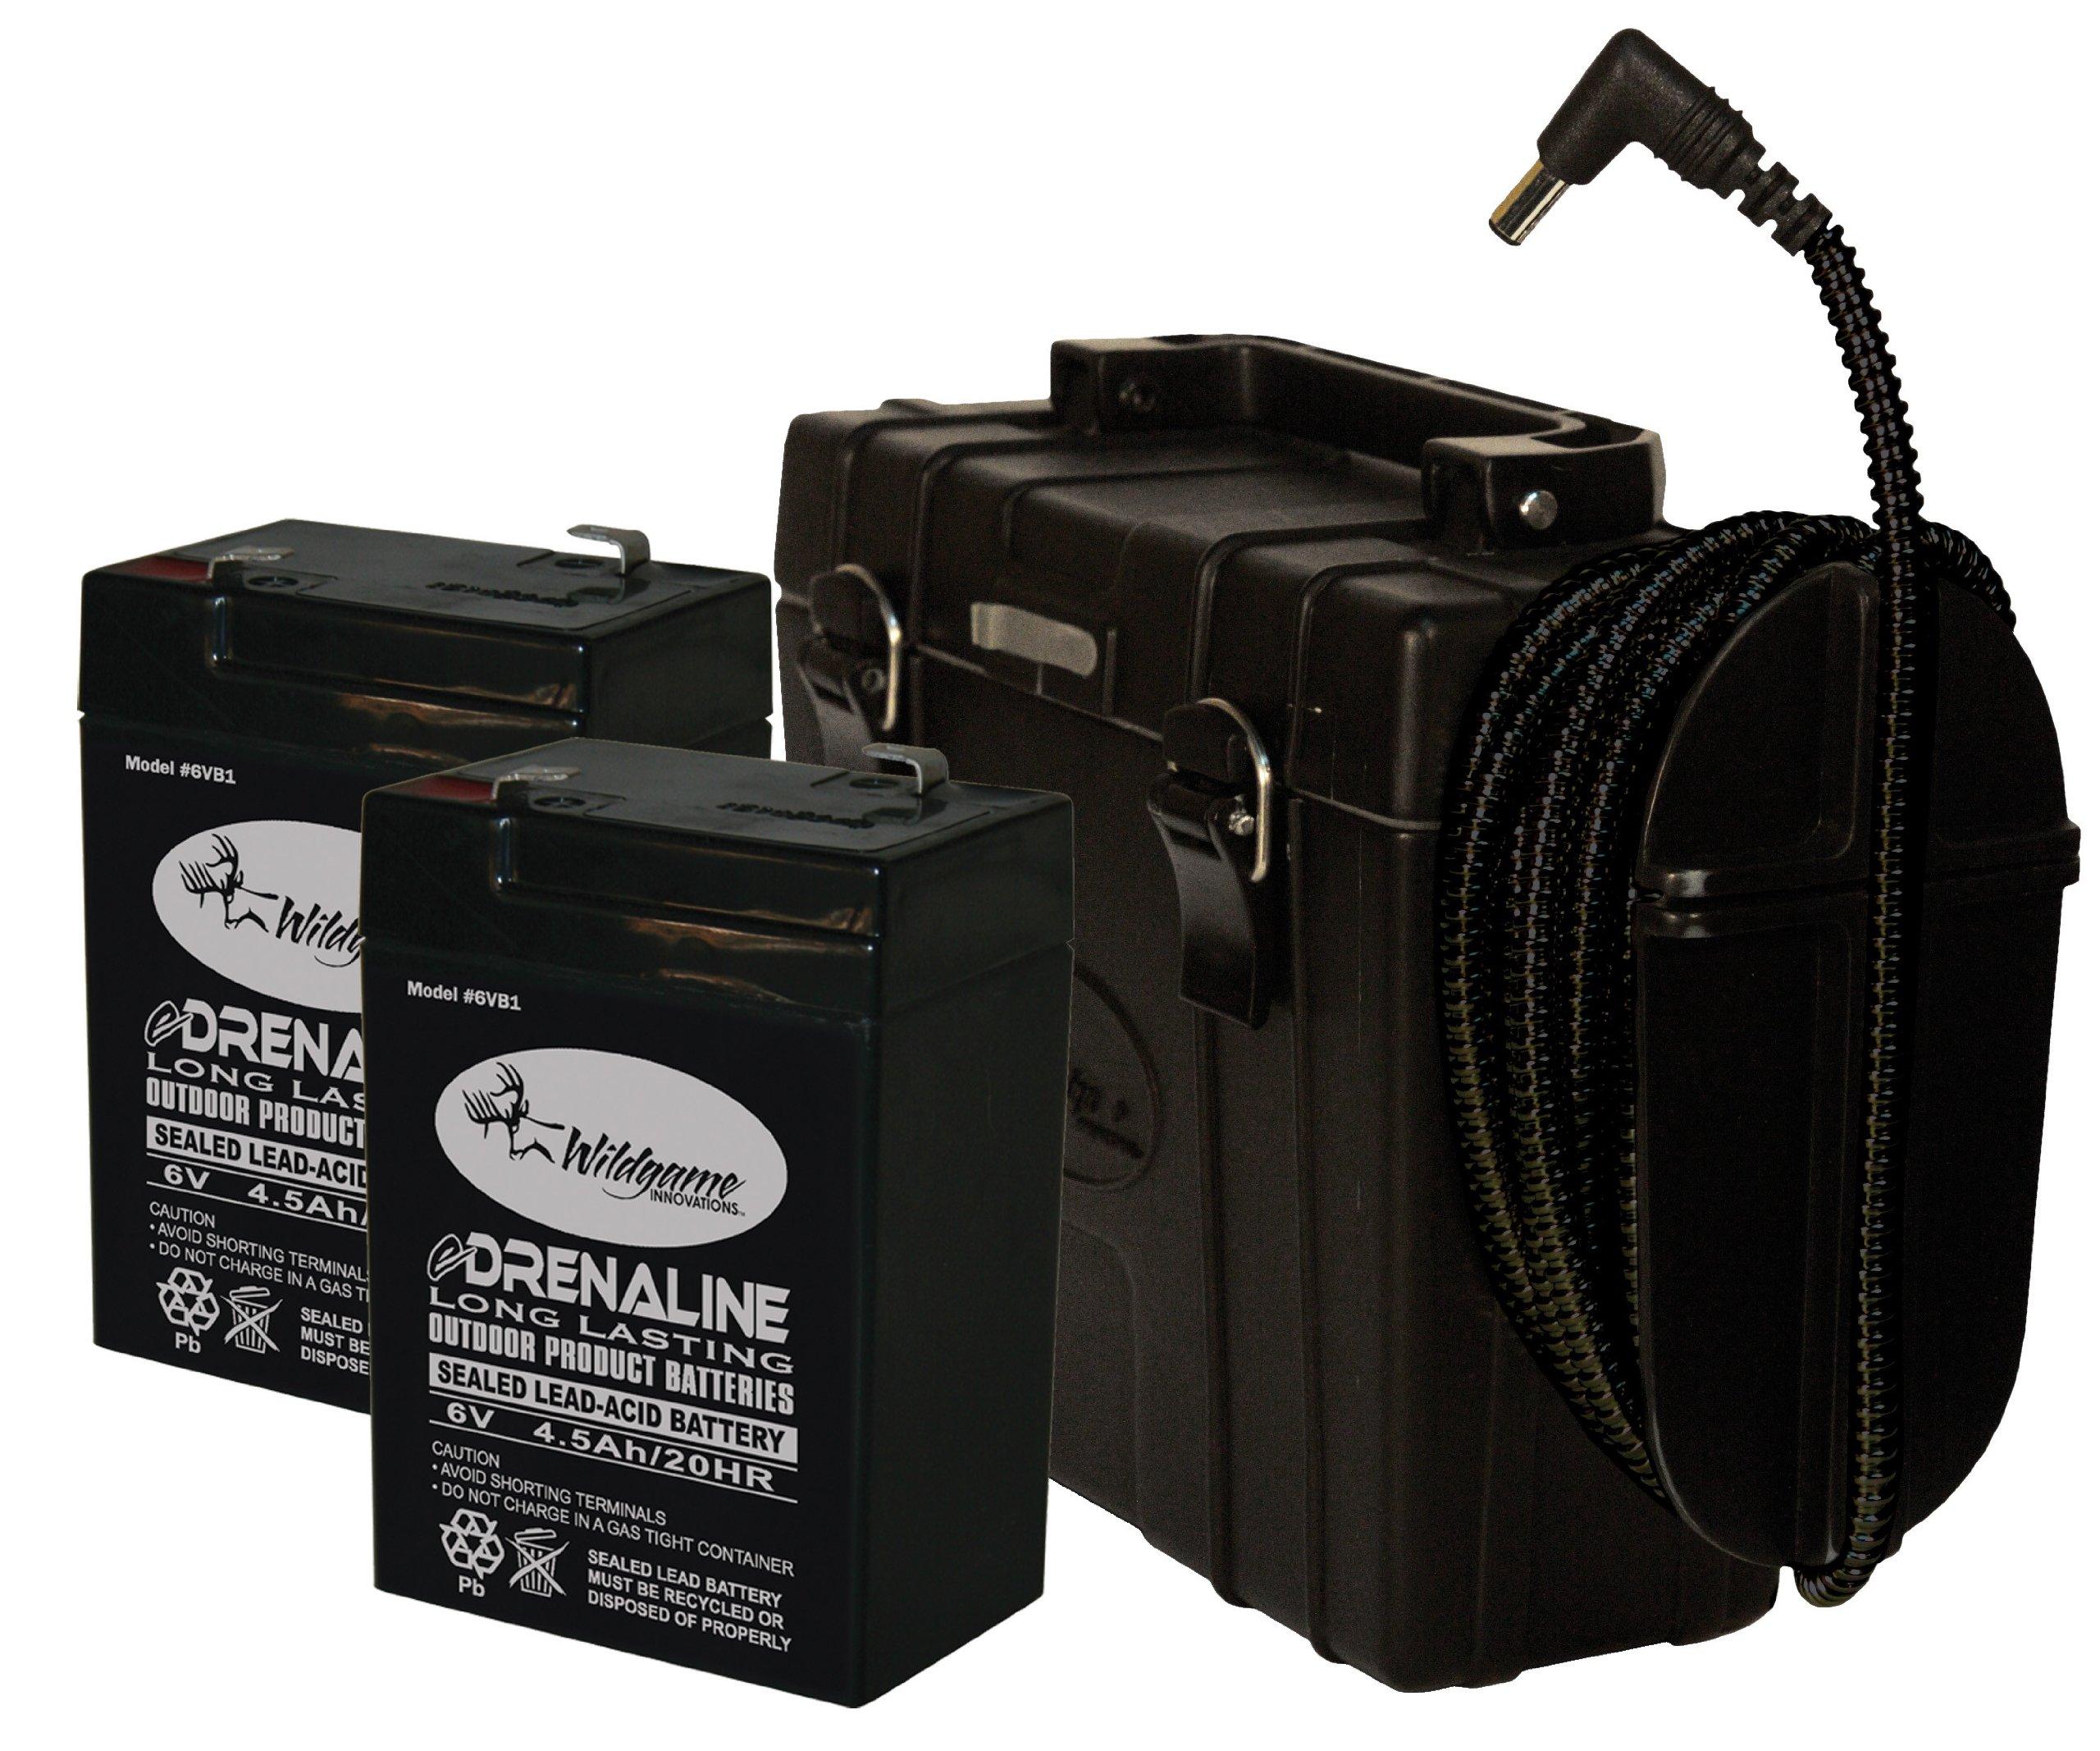 Wildgame Innovations External 6V Battery Pack